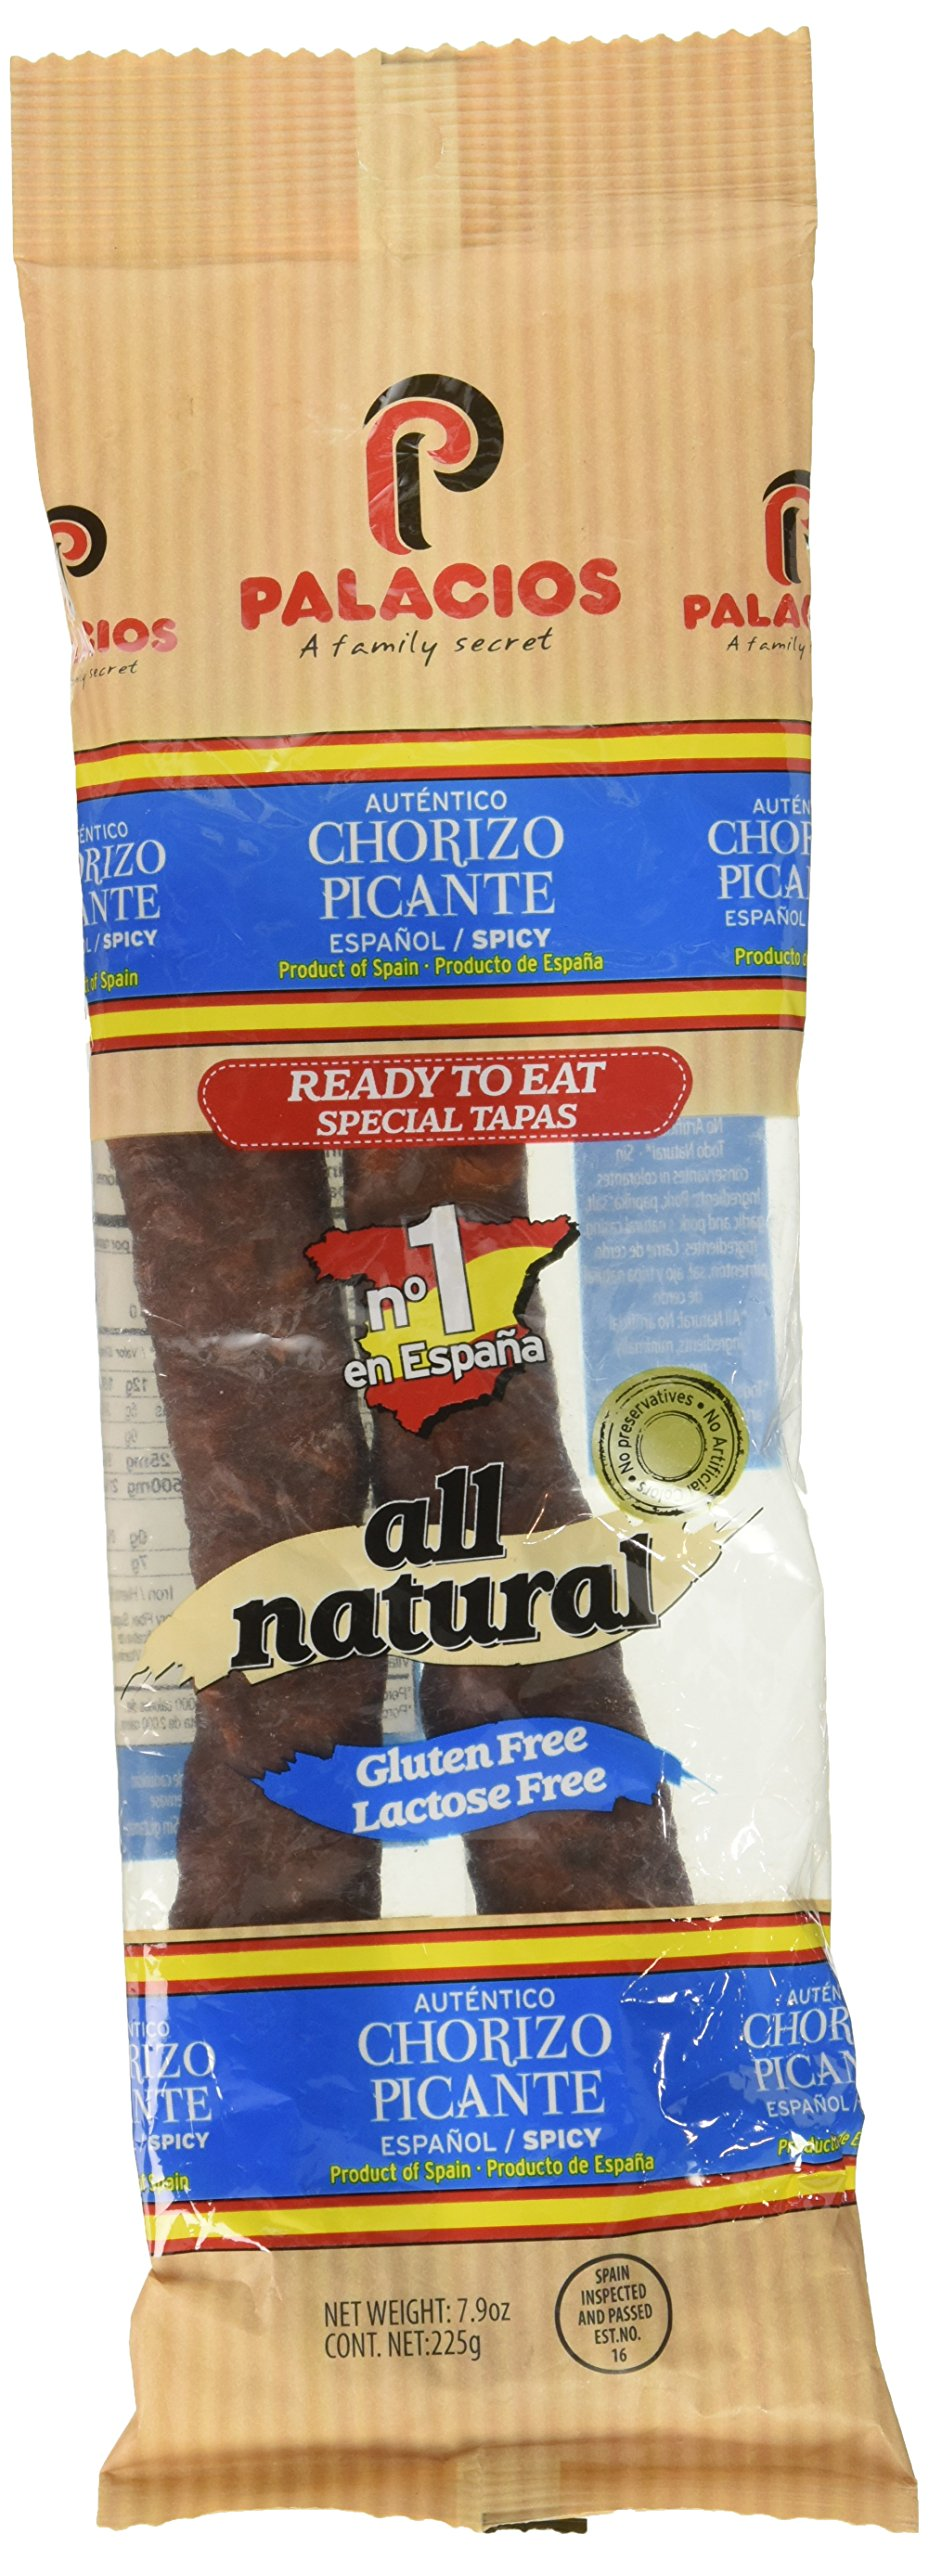 Chorizo Autentico HOT by Palacios. Imported from Spain. 7.9 oz